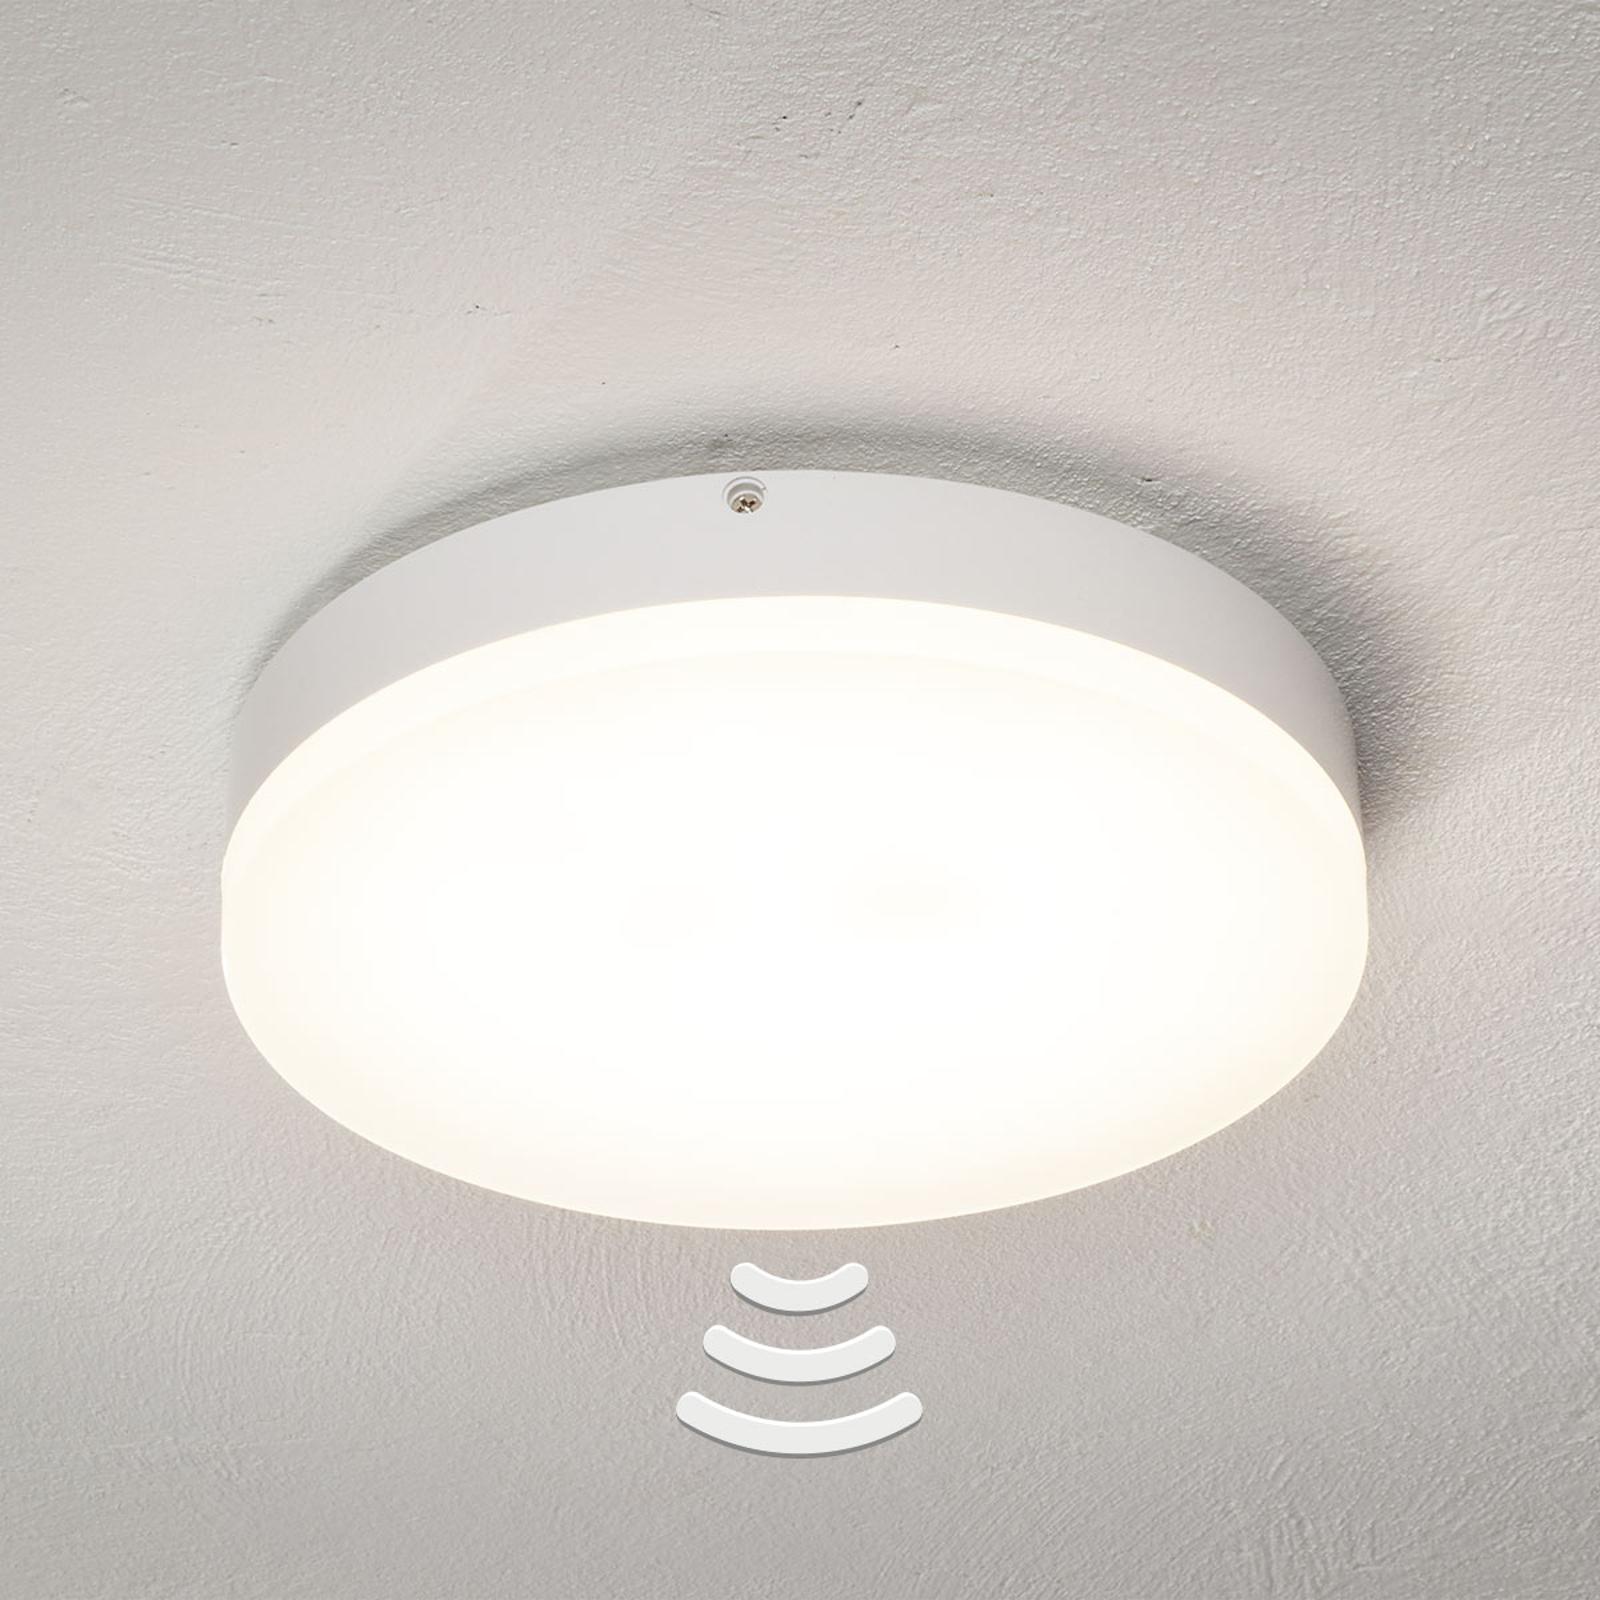 LED-Sensor-Deckenlampe Naxo, rund, 3.000 K